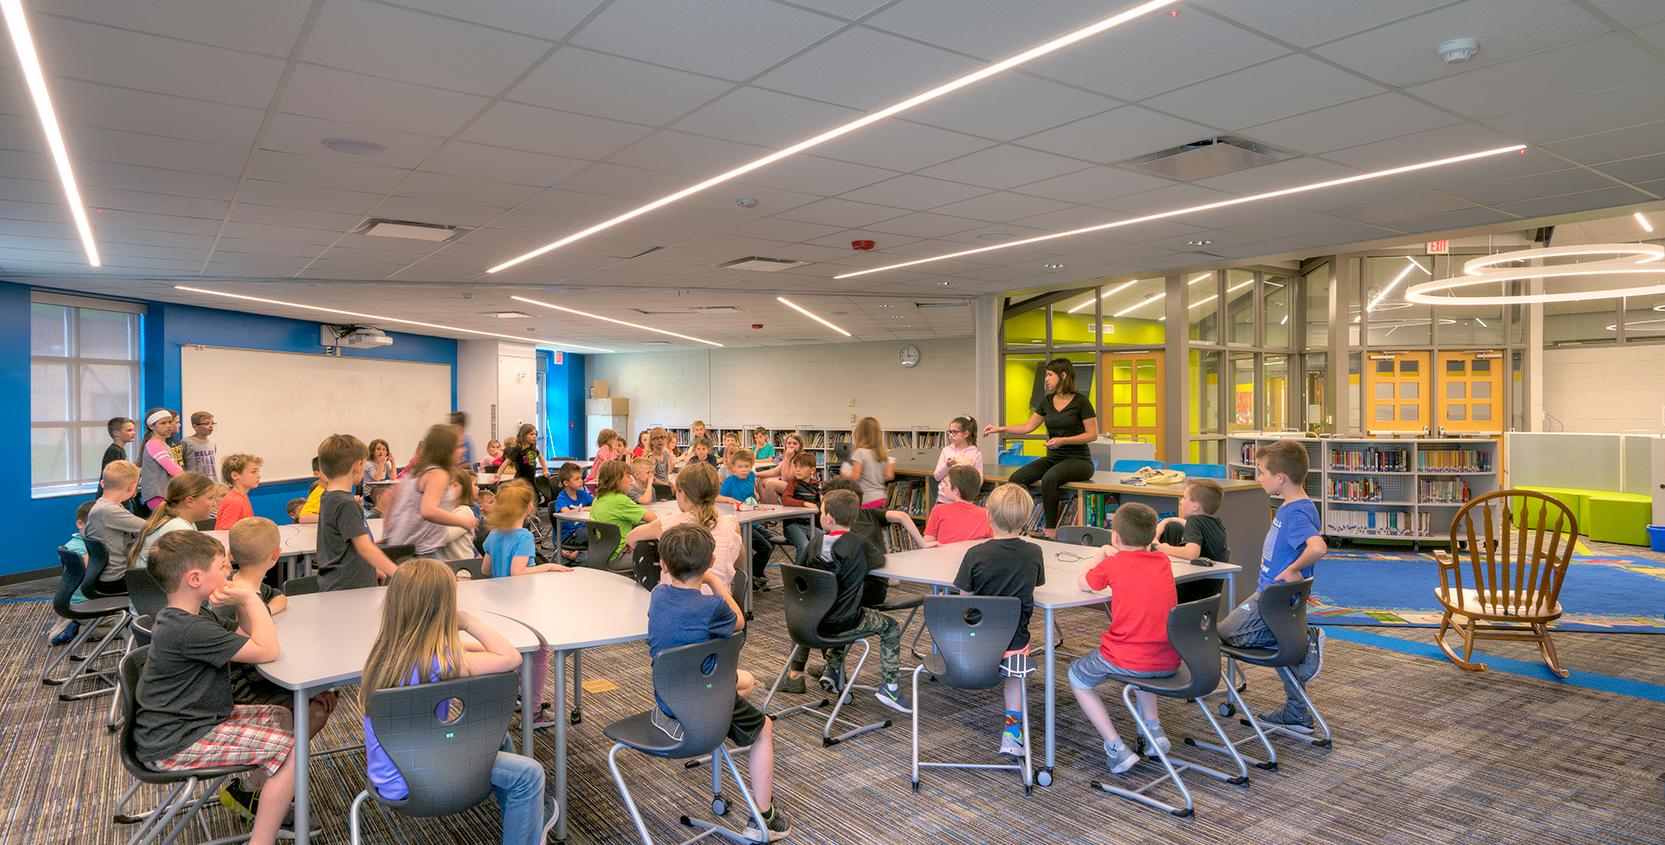 Port-Huron-Northern-High-School-Renovation-Classroom-2-1665x845